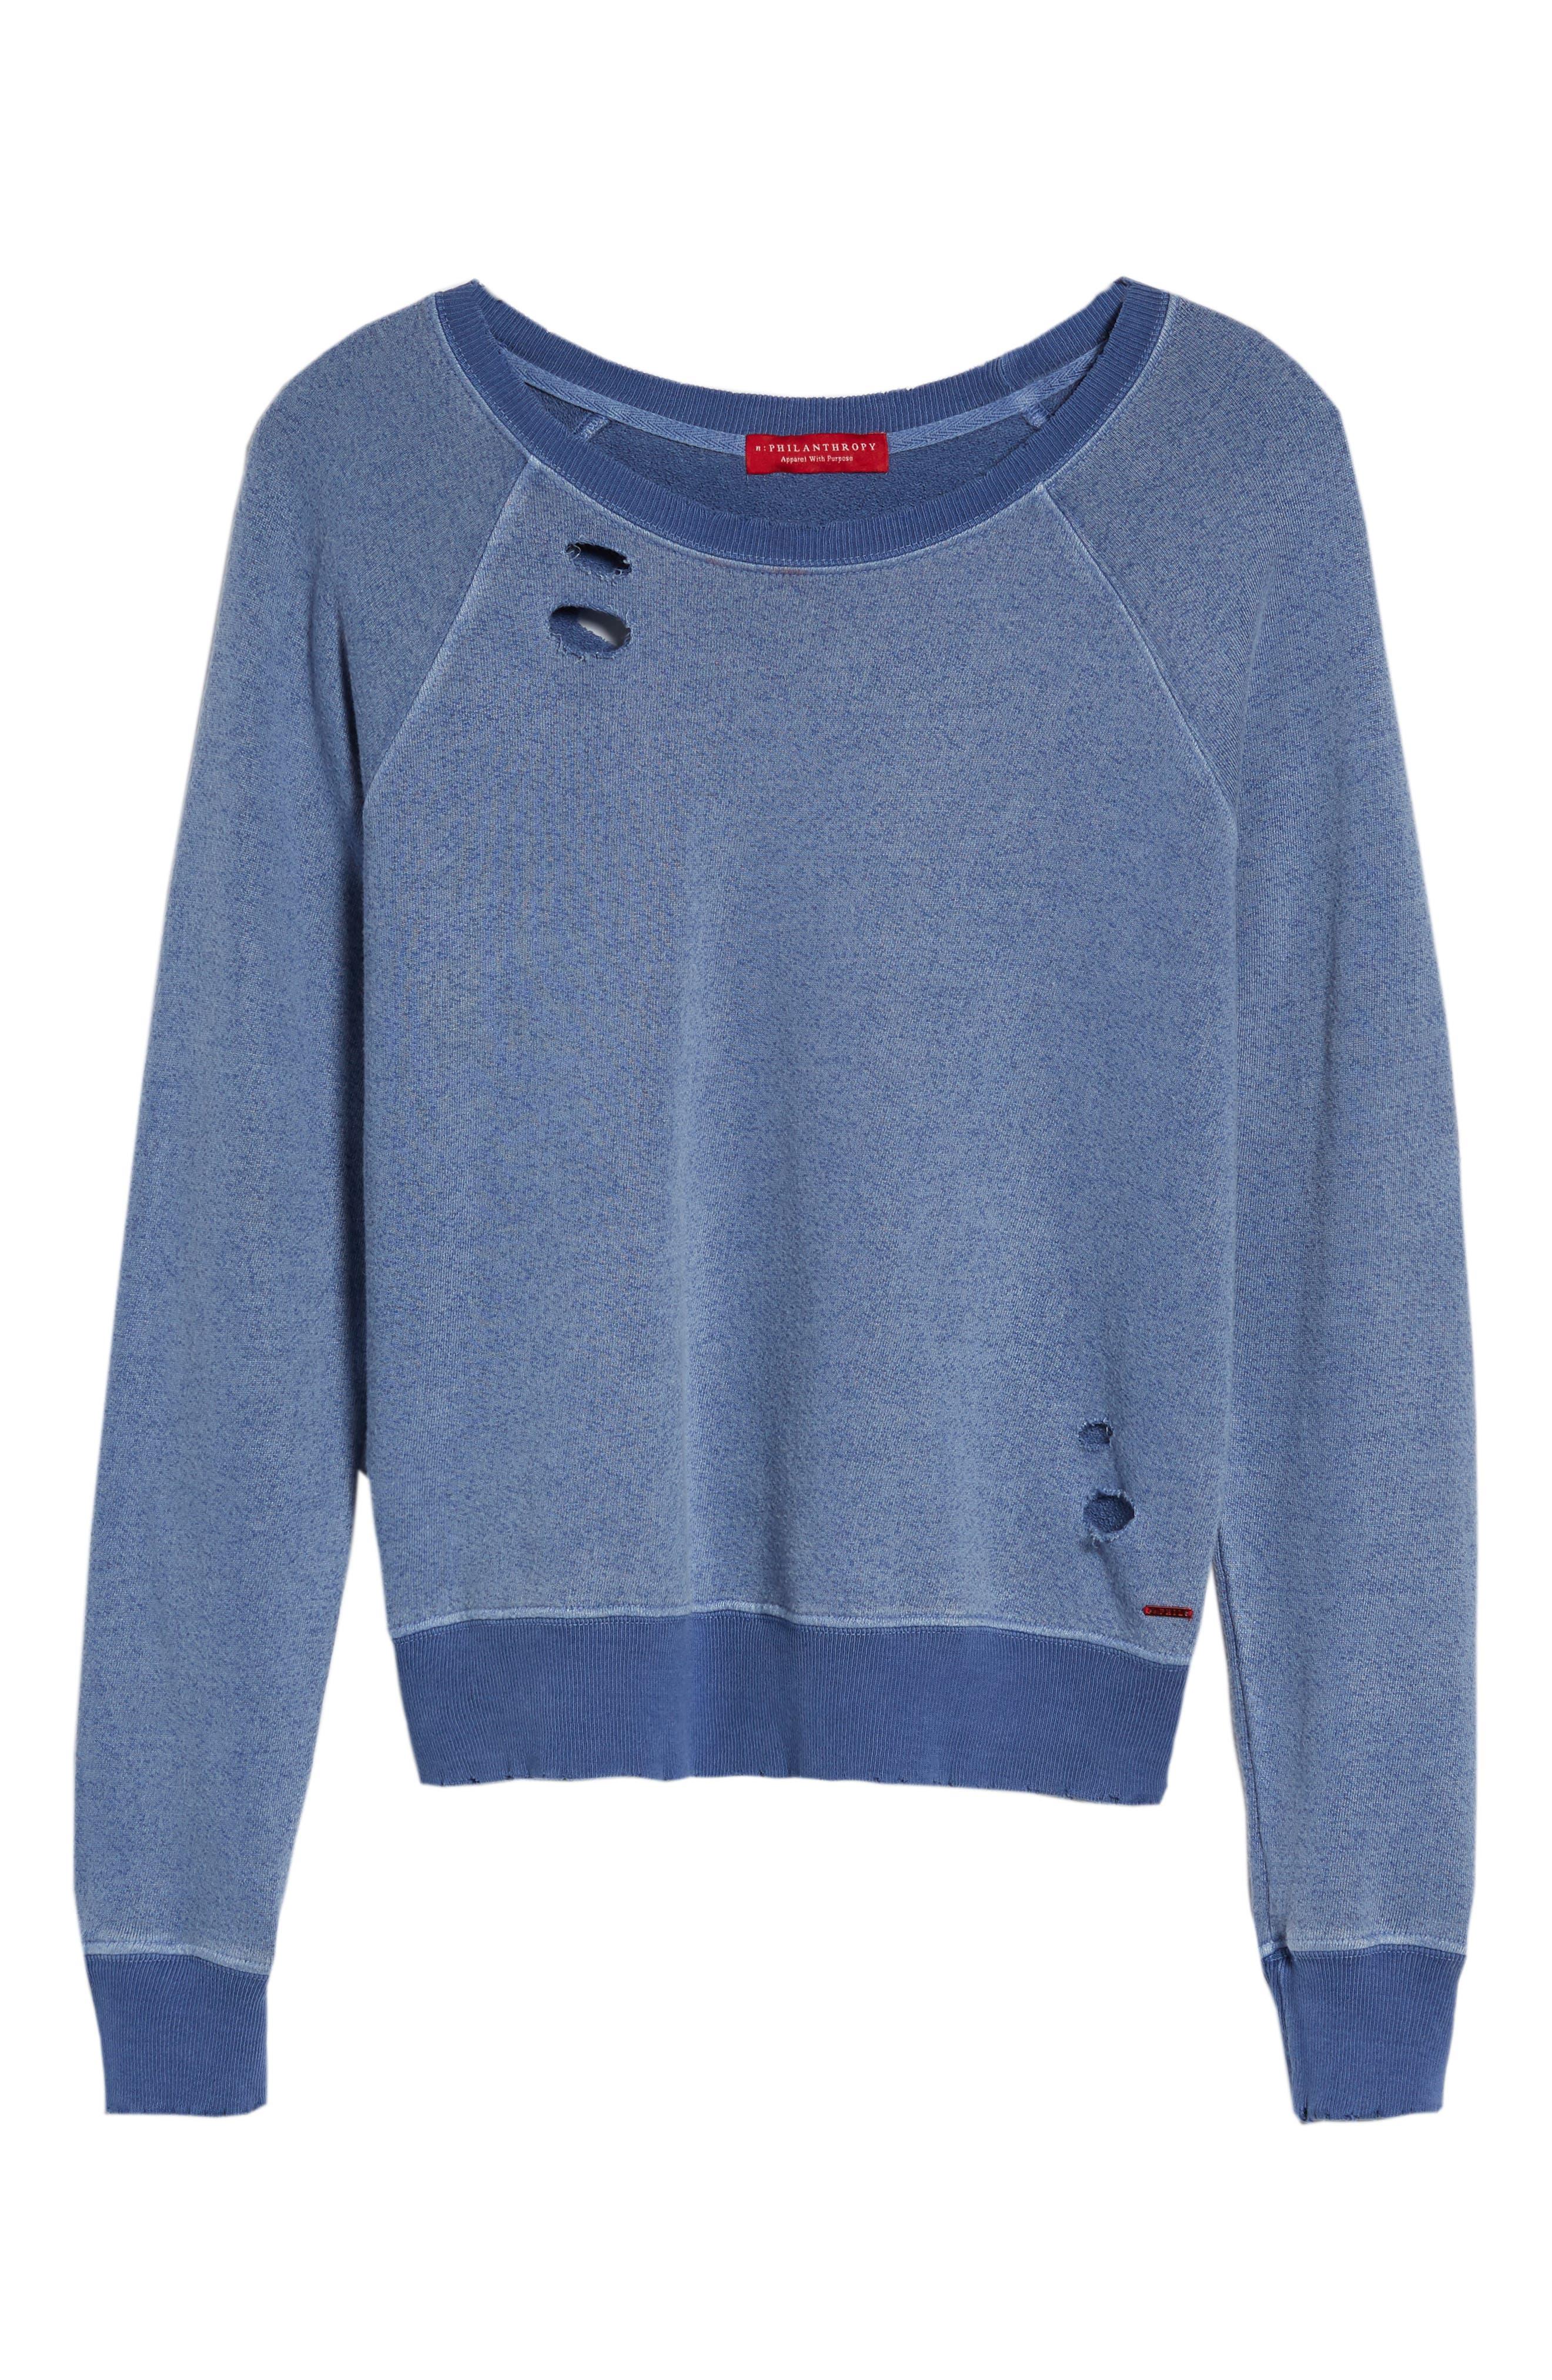 Belize Deconstructed Sweatshirt,                             Alternate thumbnail 6, color,                             COBALT